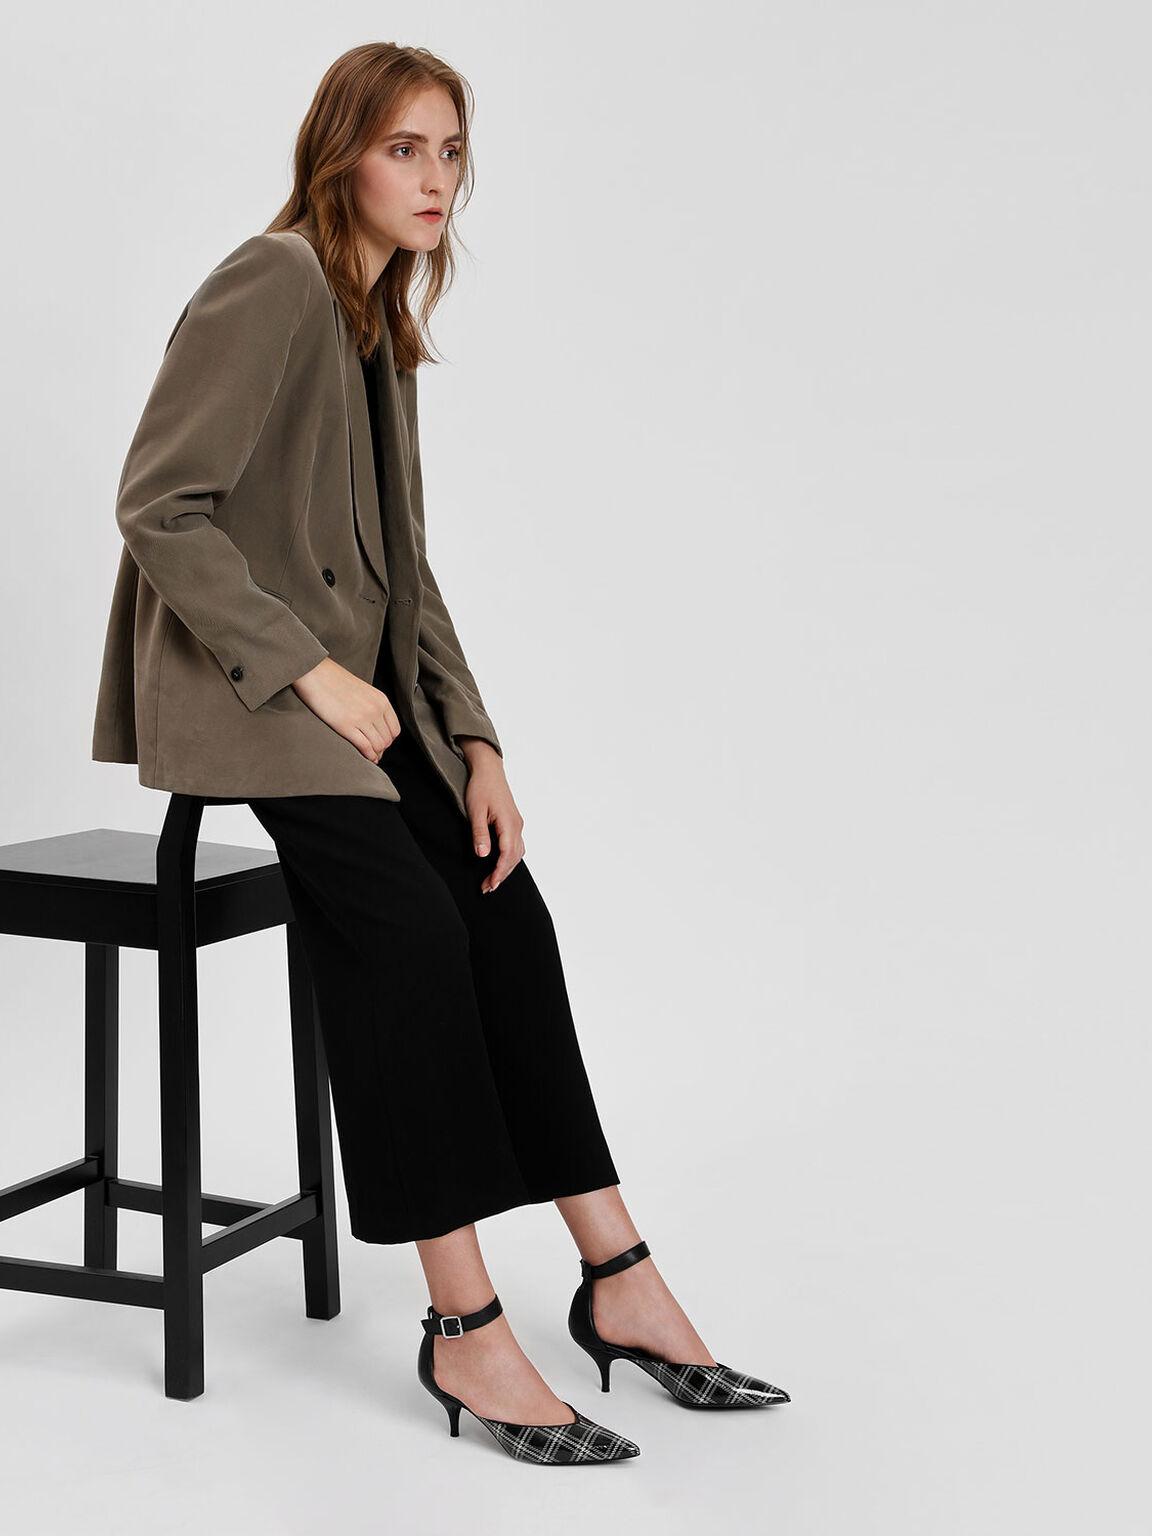 Ankle Strap Leather Heels, Black Textured, hi-res